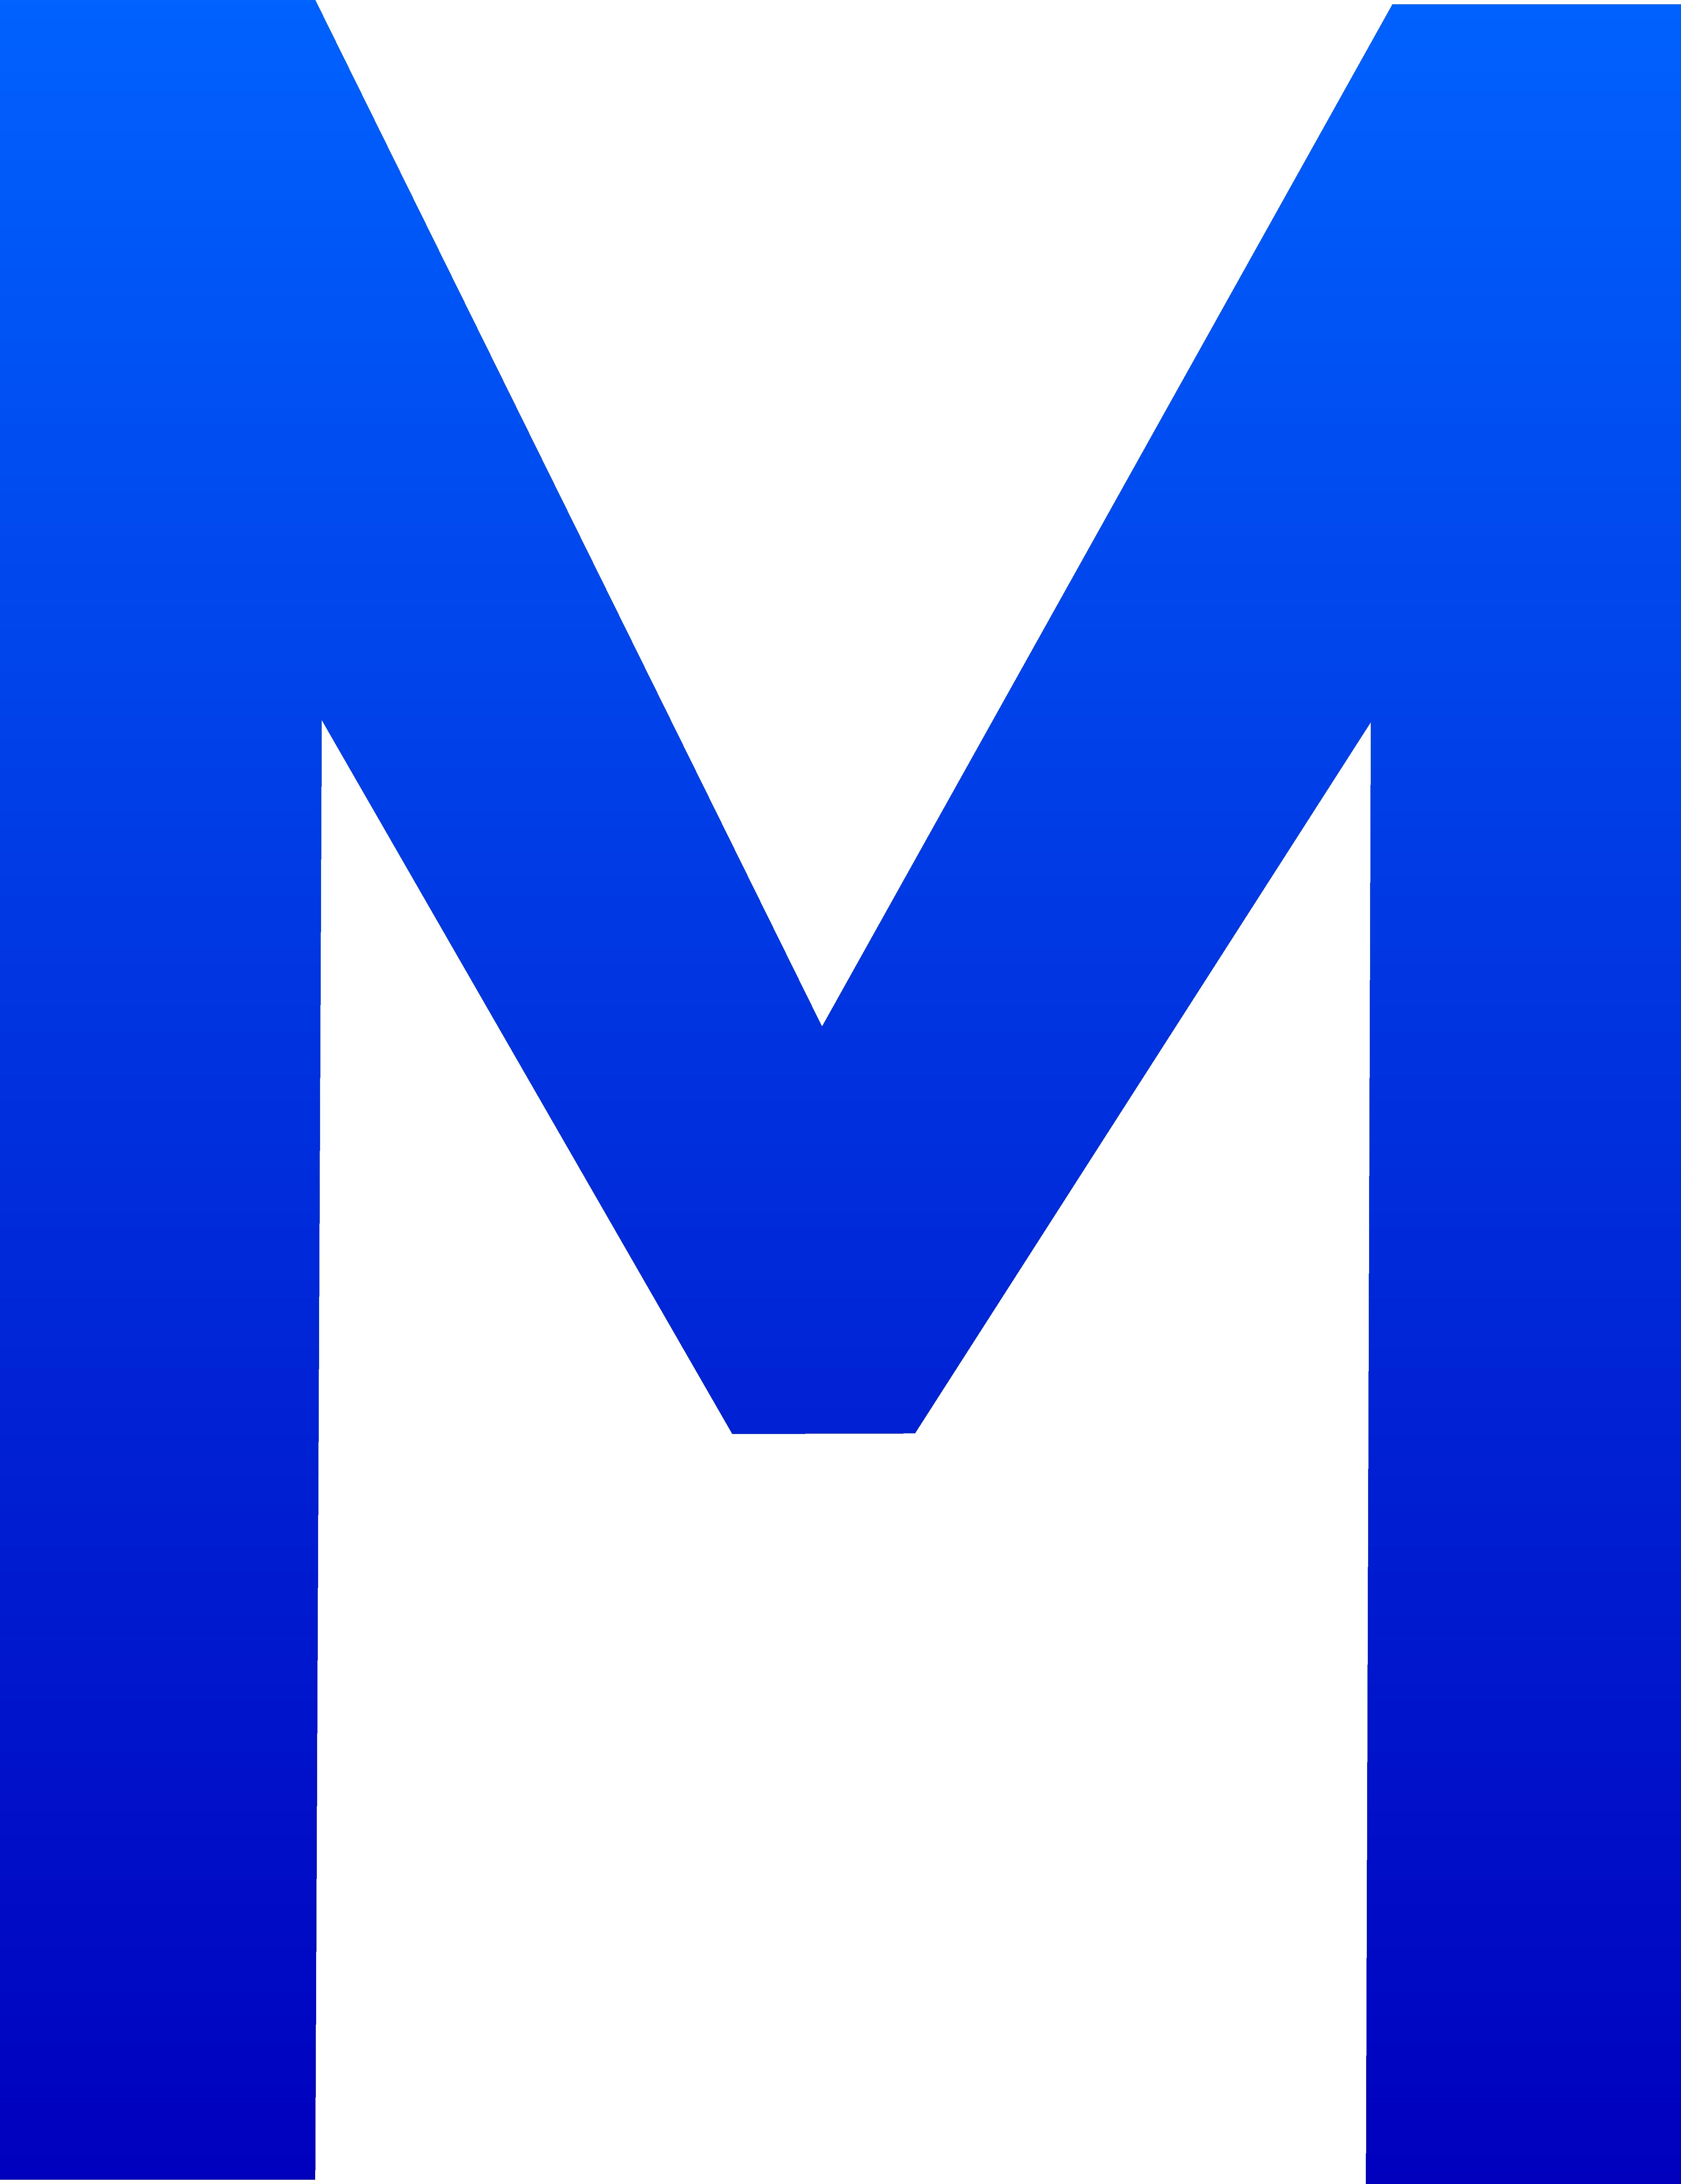 Letter M Clipart & Letter M Clip Art Images - ClipartALL.com svg black and white